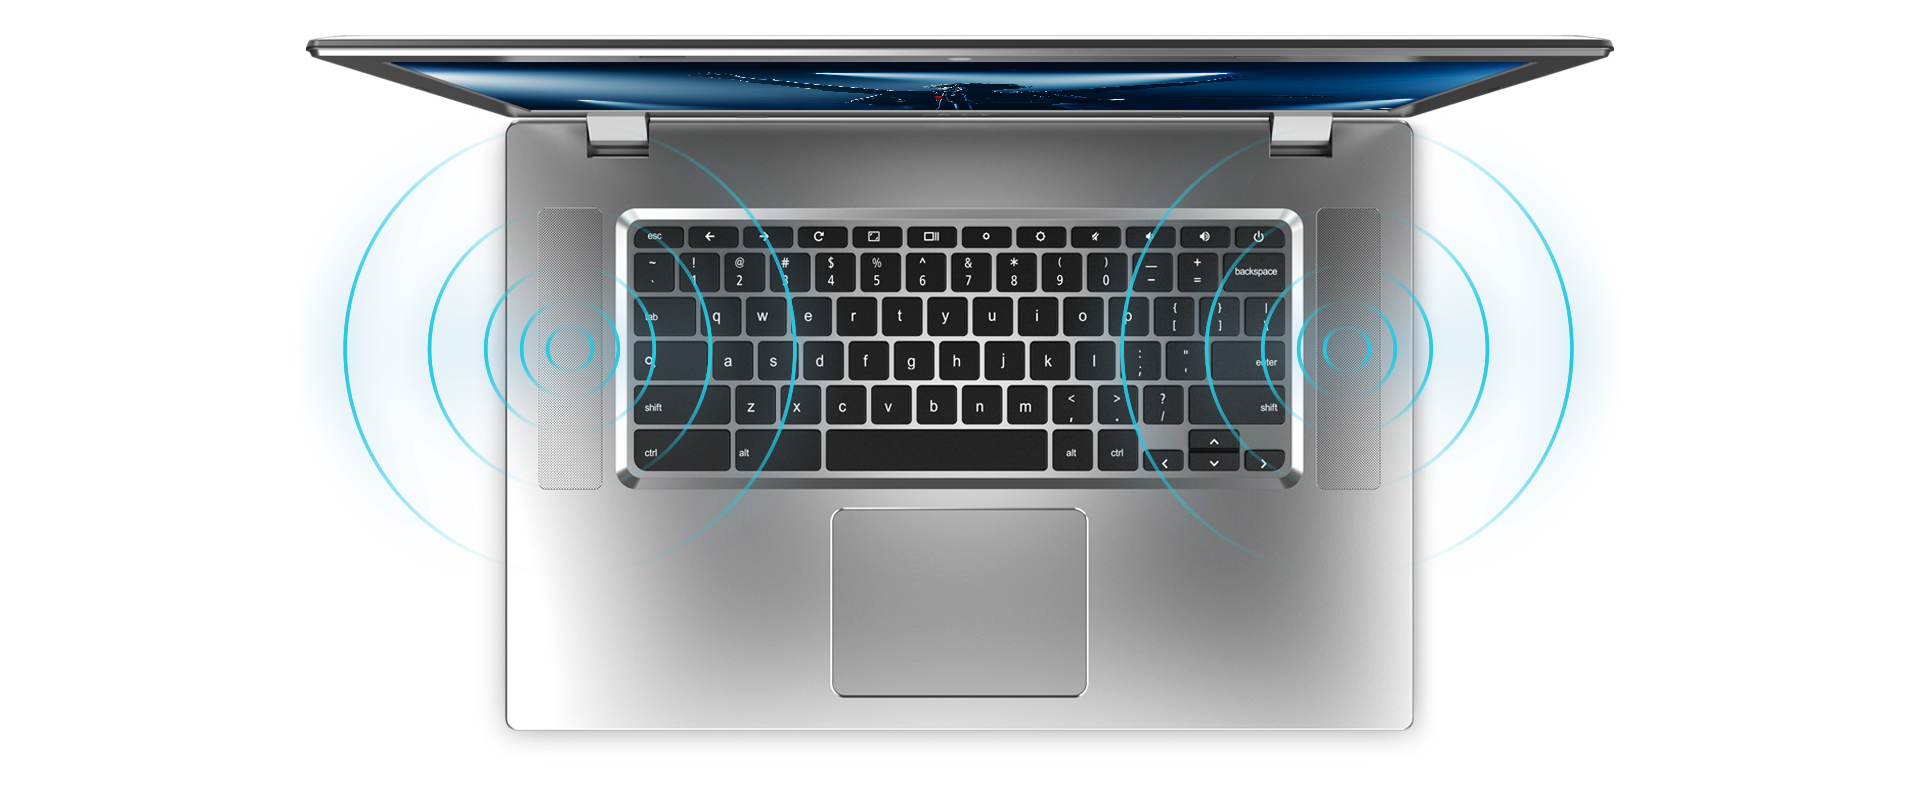 Acer Chromebook 315 - Large